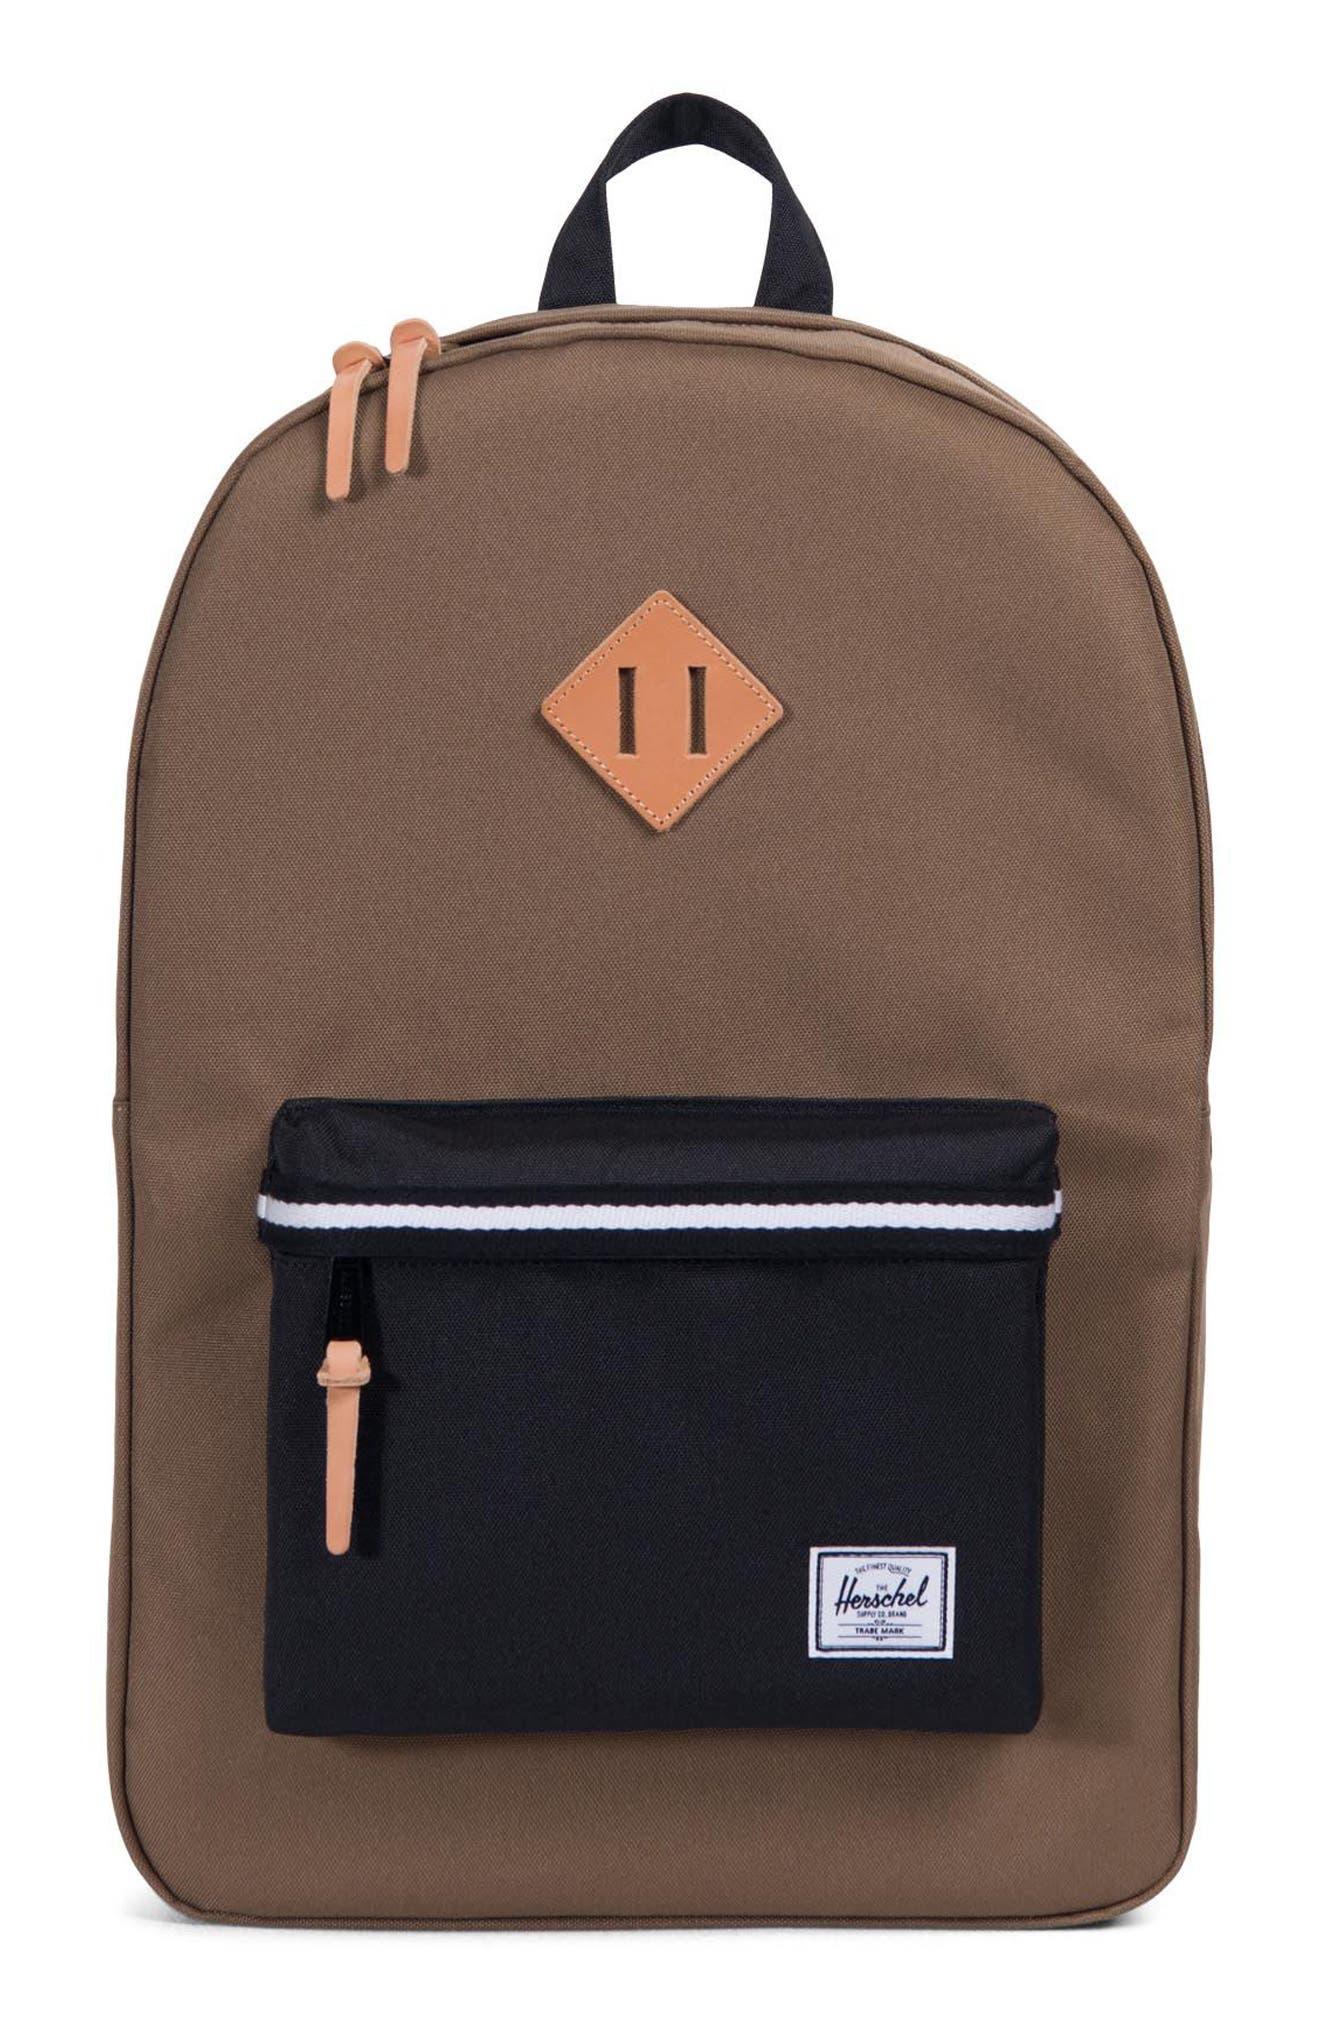 Heritage Offset Stripe Backpack,                             Main thumbnail 1, color,                             Cub/ Black/ White